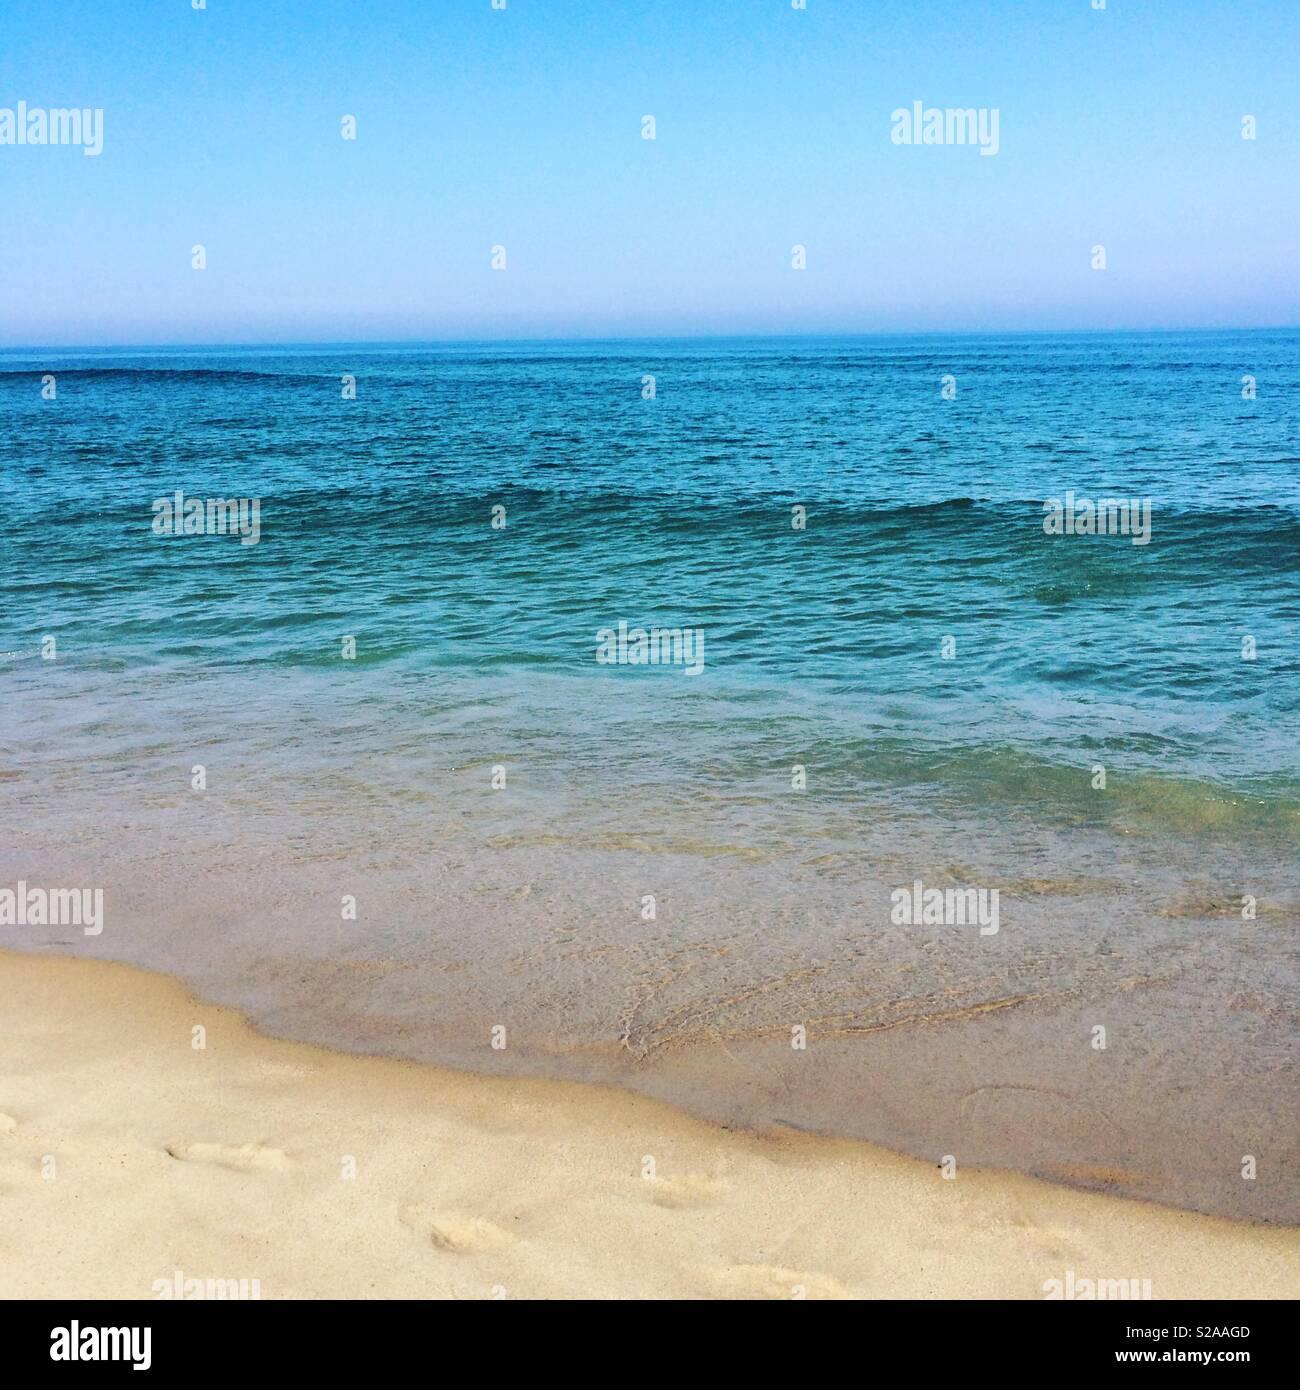 Coast Guard Beach Stock Photos & Coast Guard Beach Stock